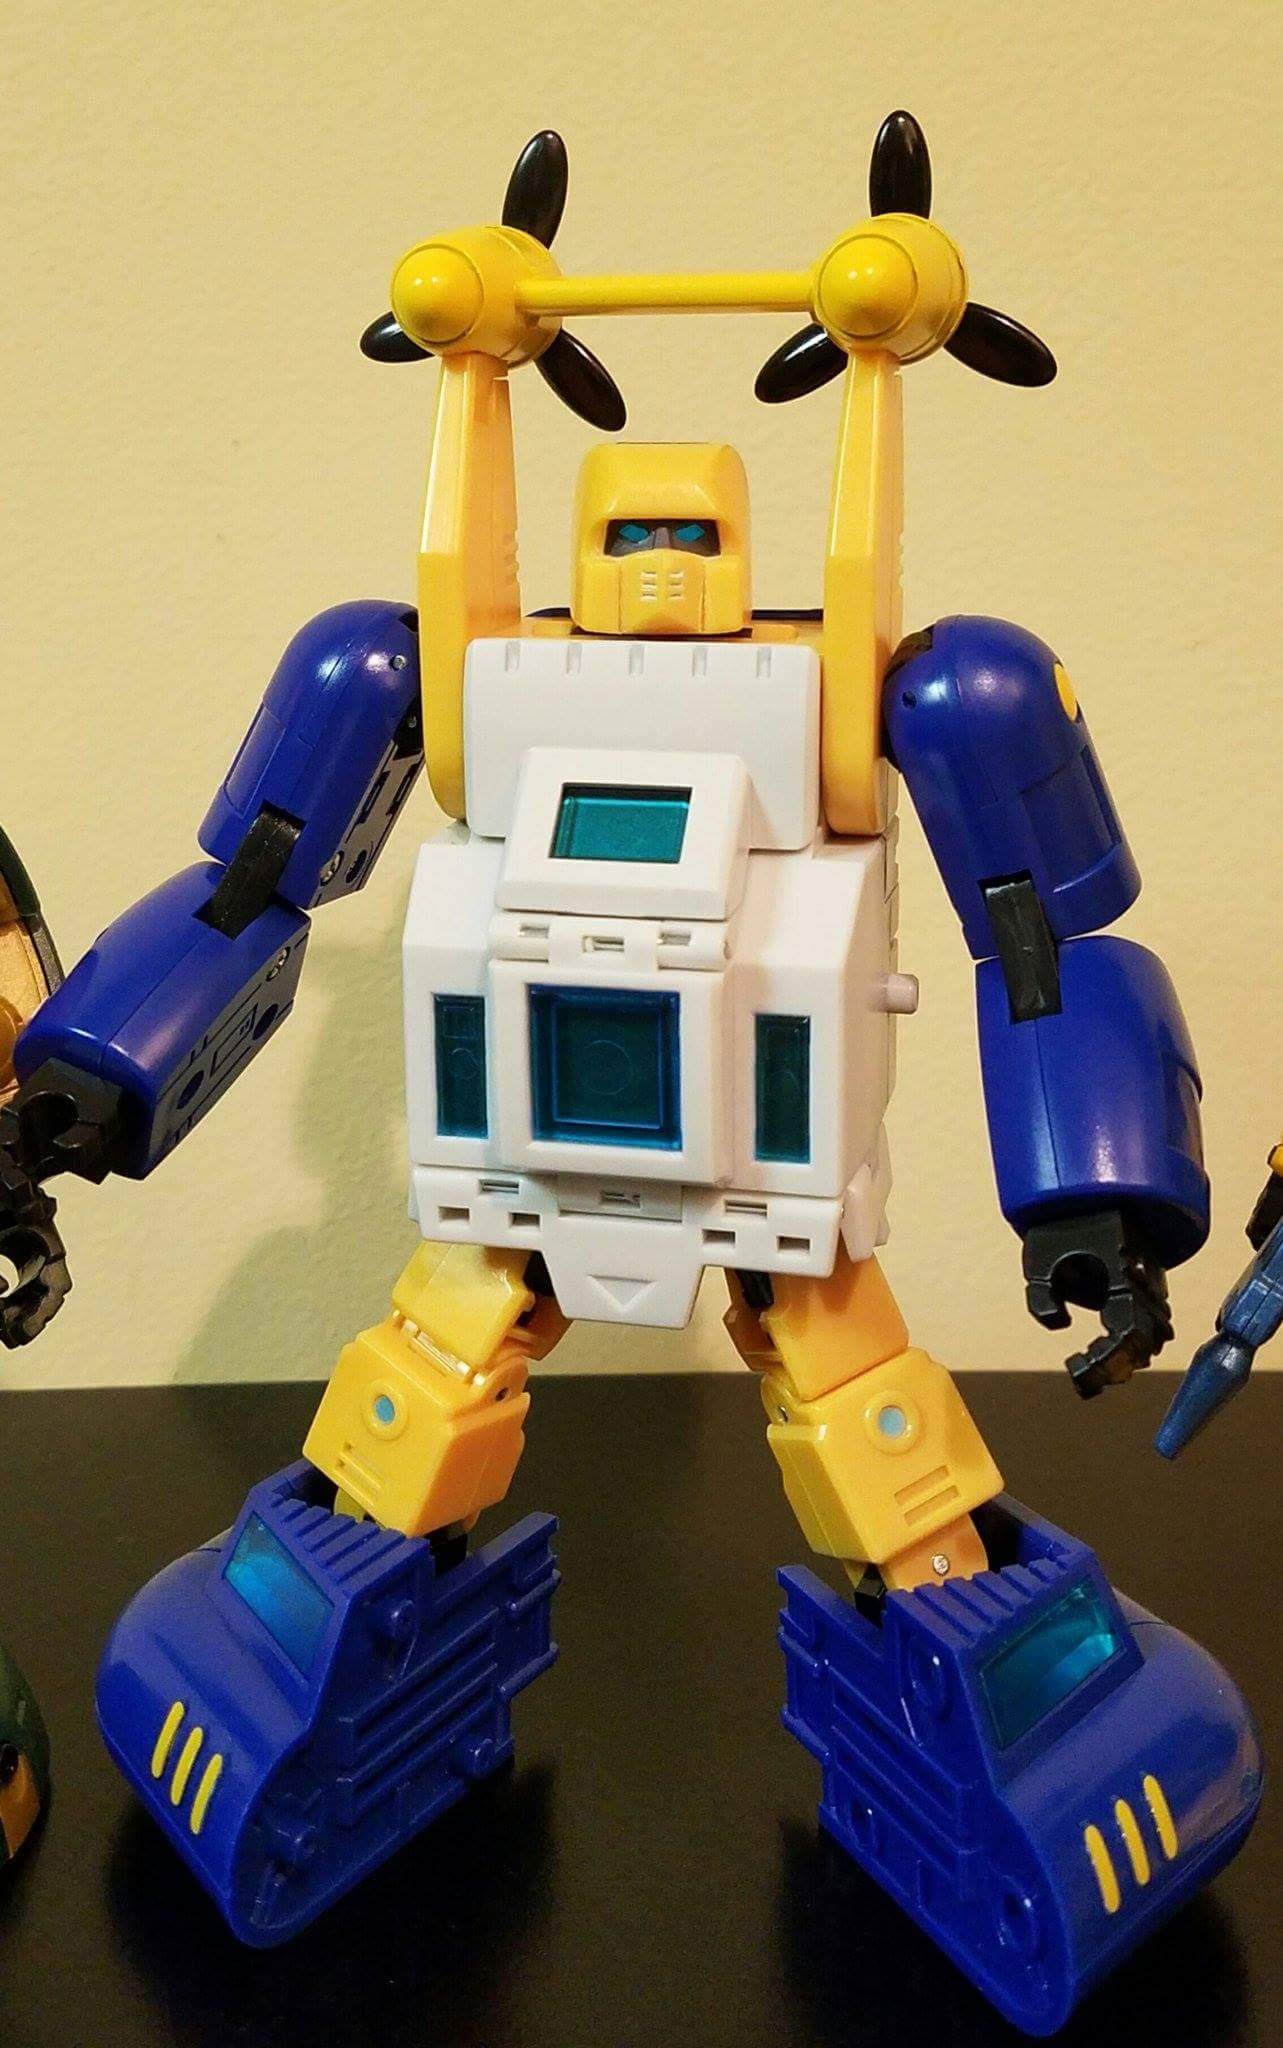 [Toyworld][Zeta Toys] Produit Tiers - Minibots MP - Gamme EX - Page 3 At3gY0P9